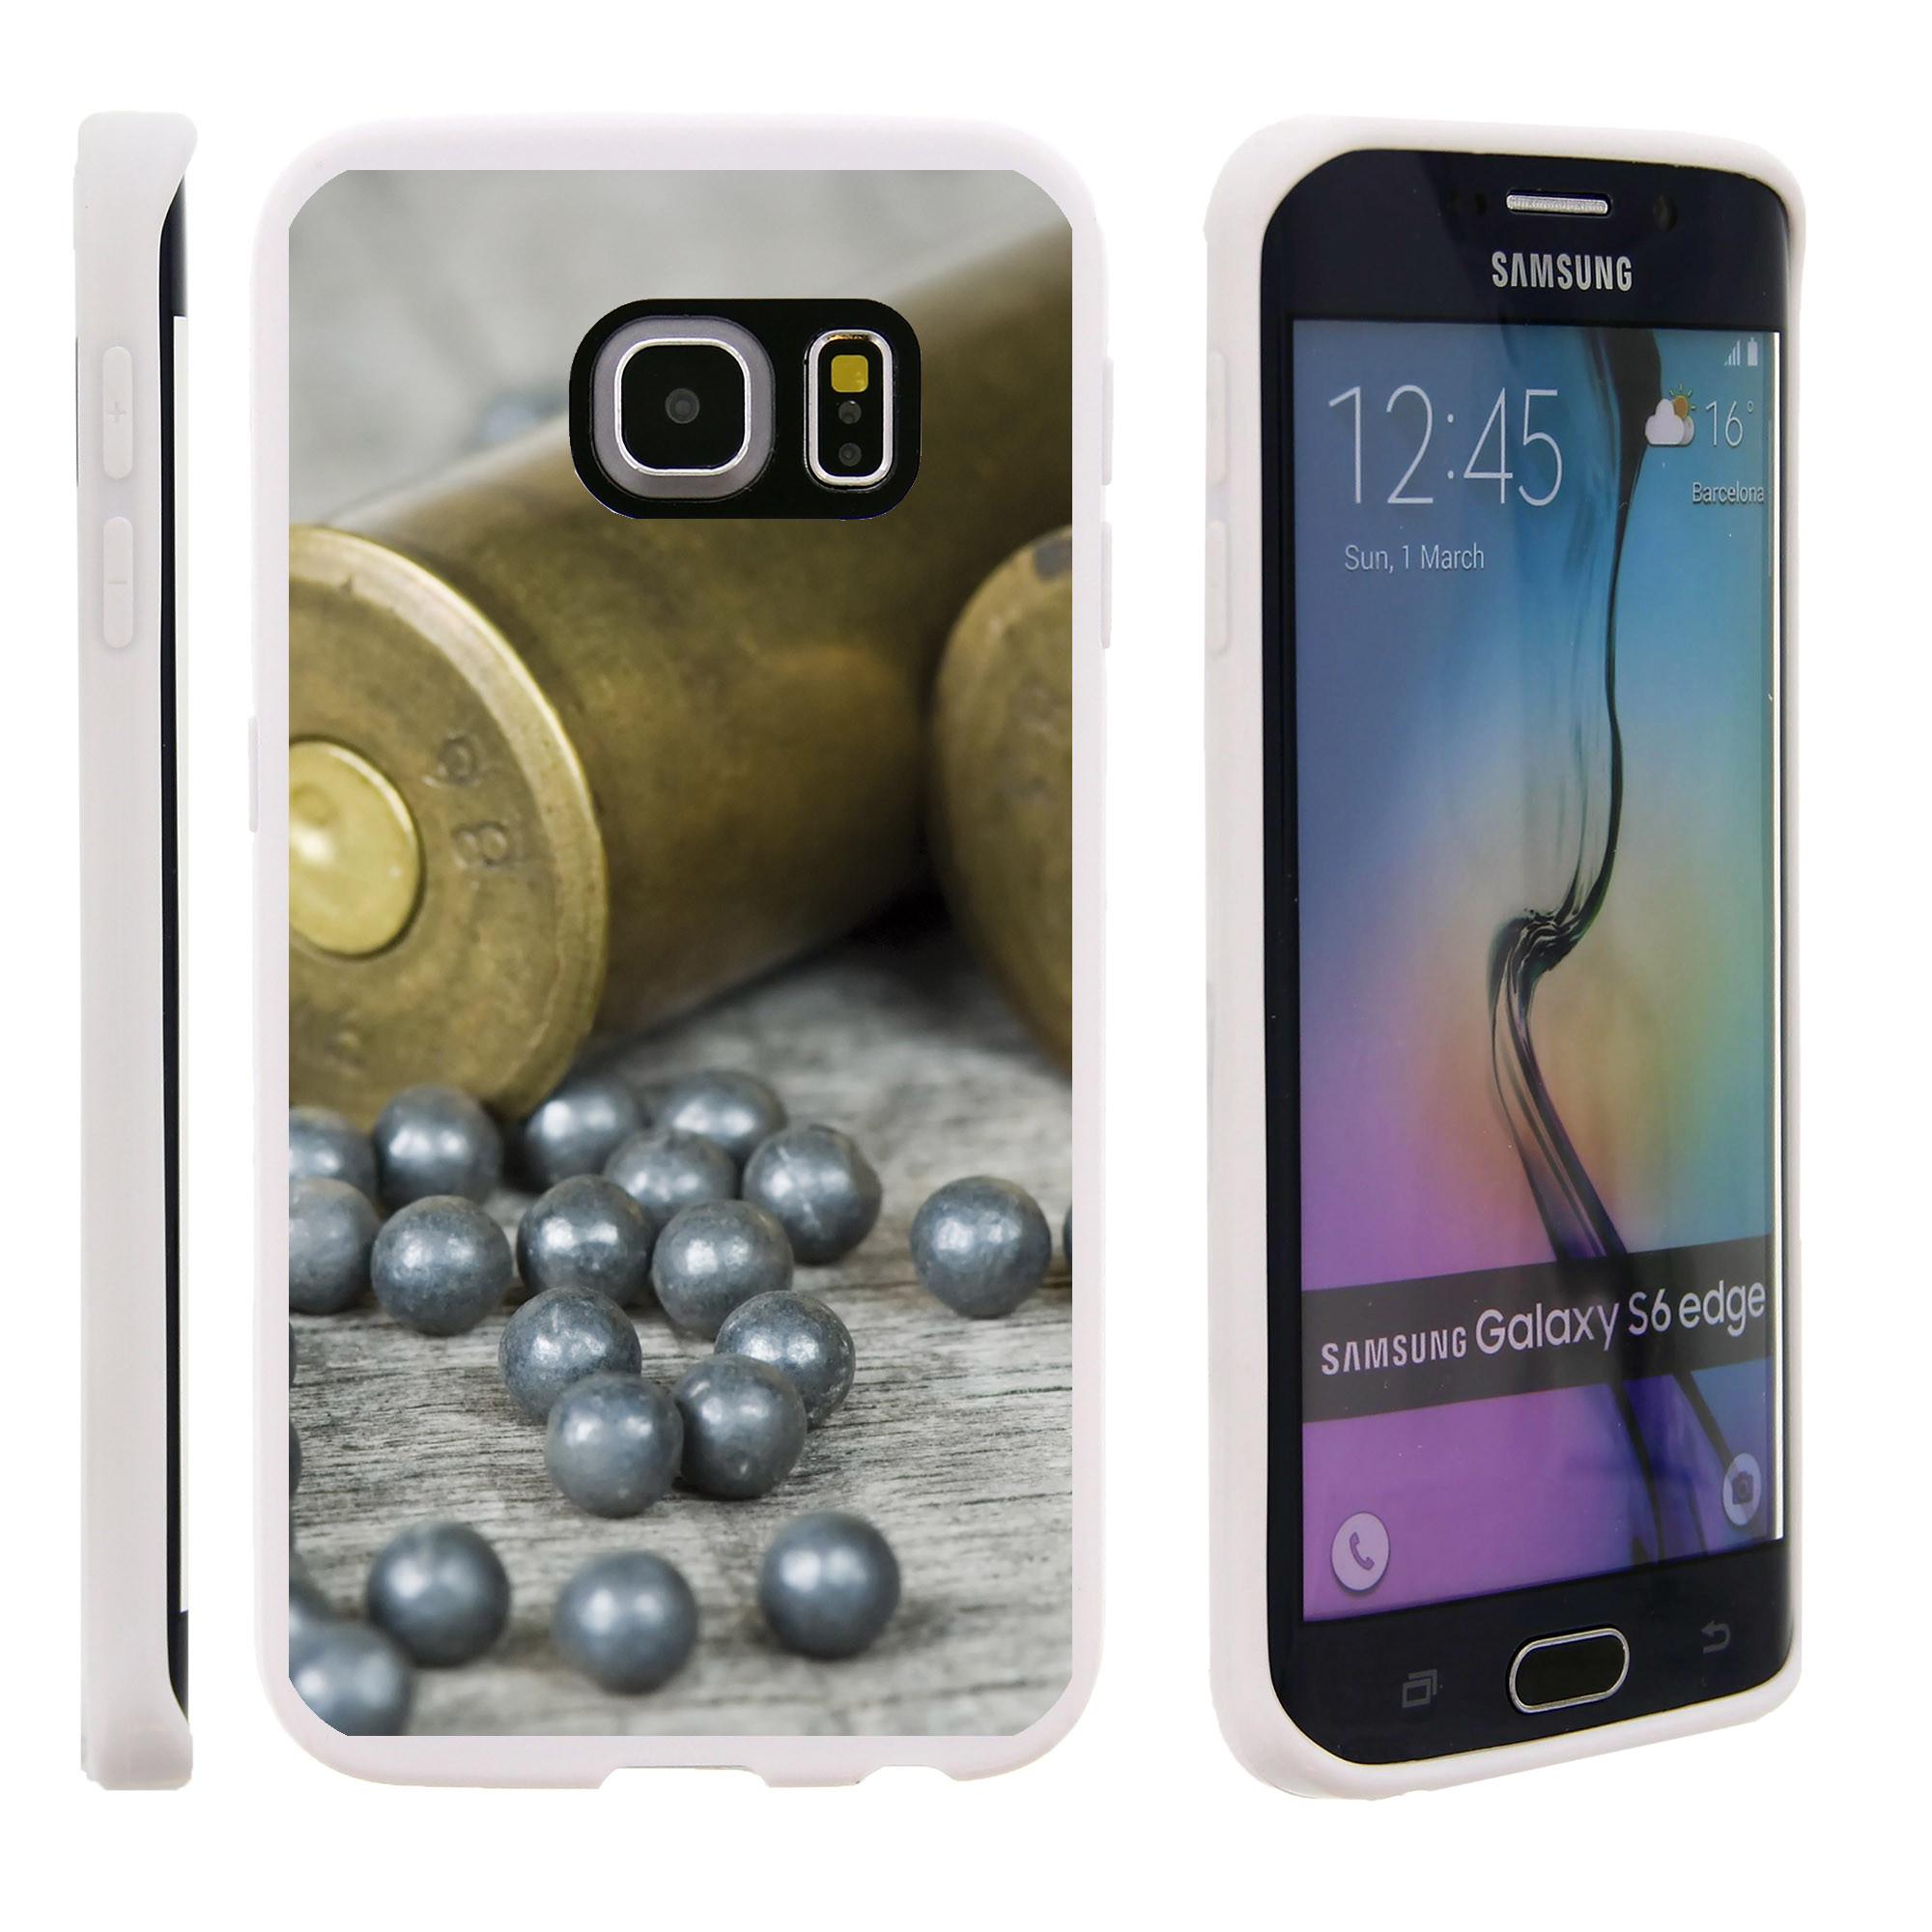 Samsung Galaxy S6 Edge G925, Flexible Case [FLEX FORCE] Slim Durable TPU Sleek Bumper with Unique Designs - Gunpowder balls